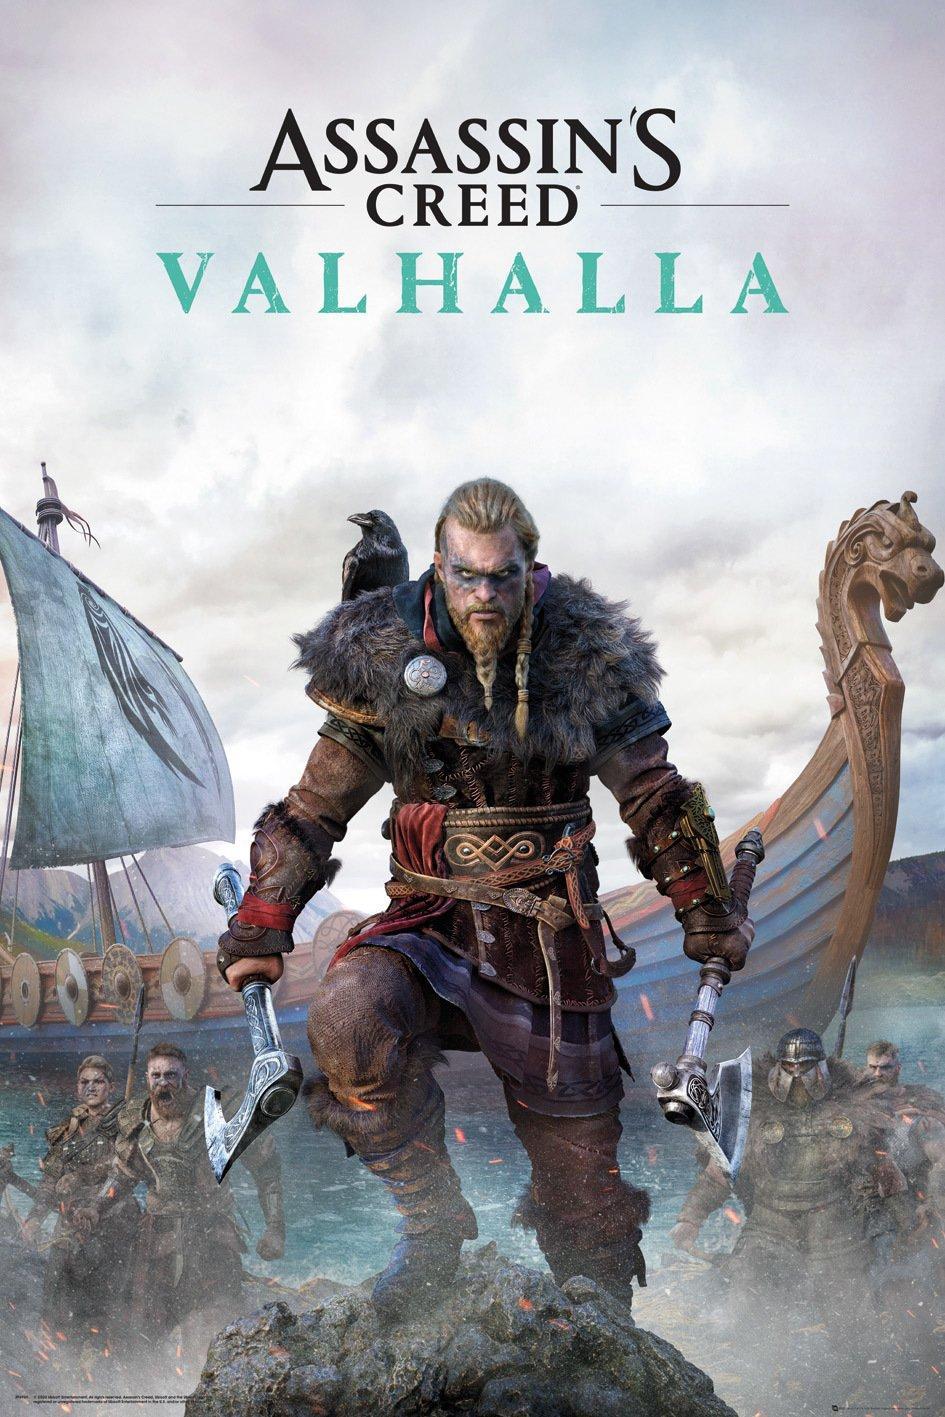 ASSASSIN'S CREED VALHALLA - Poster '61x91.5cm'_1